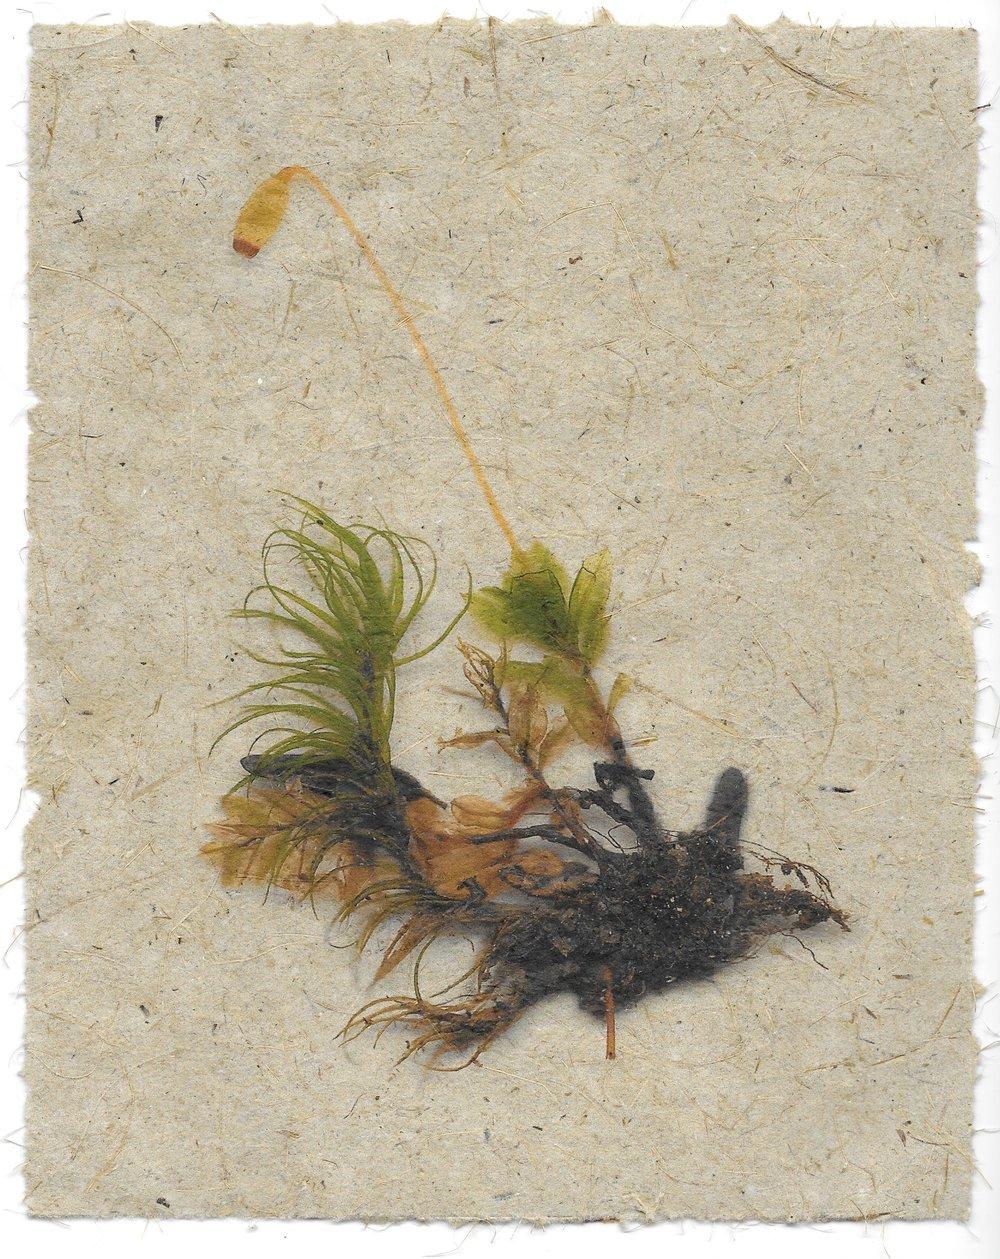 moss specimen #1